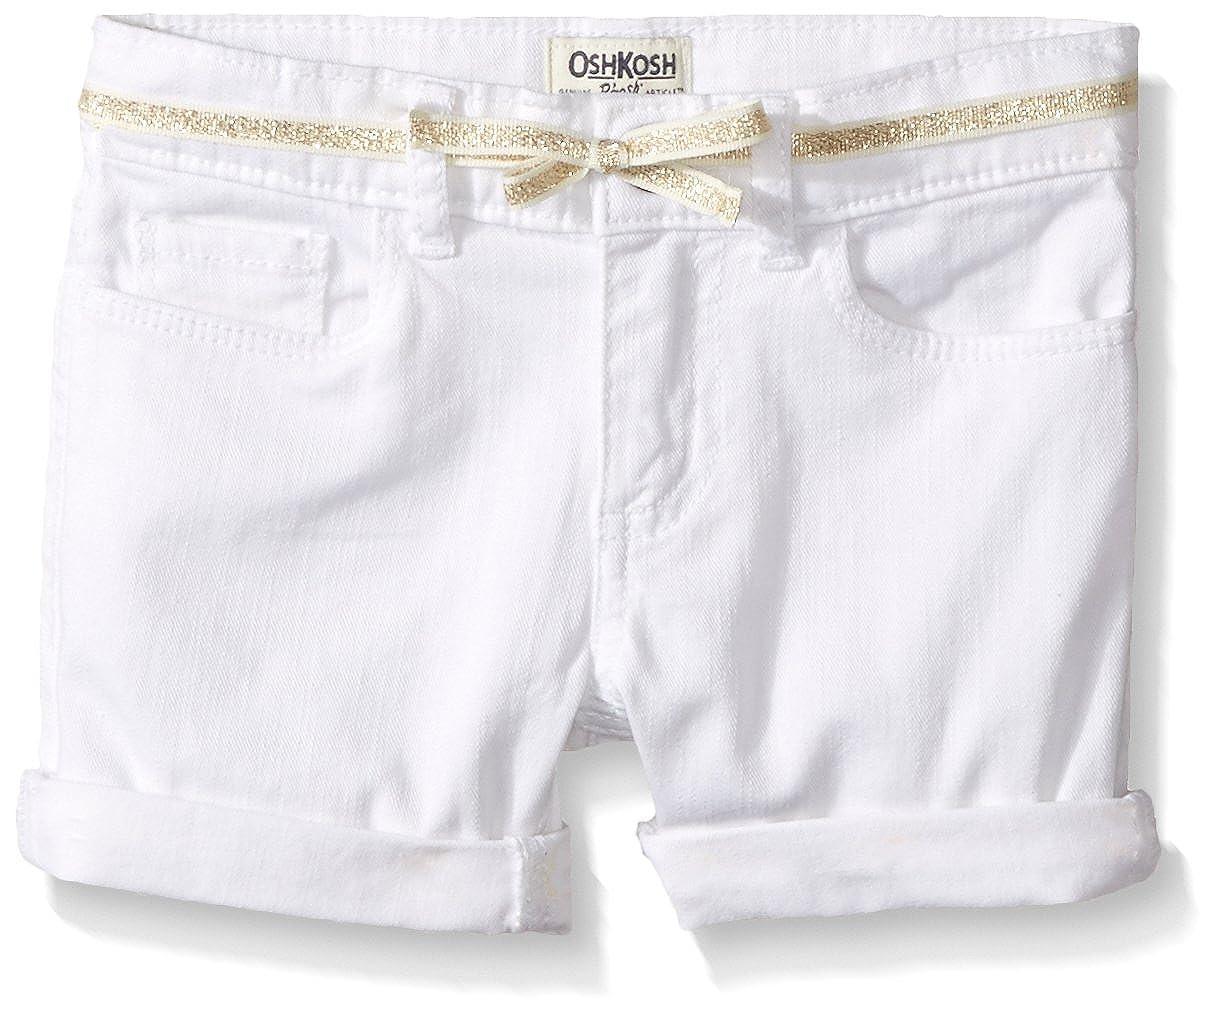 OshKosh BGosh Girls Woven Short 21234510 OshKosh BGosh